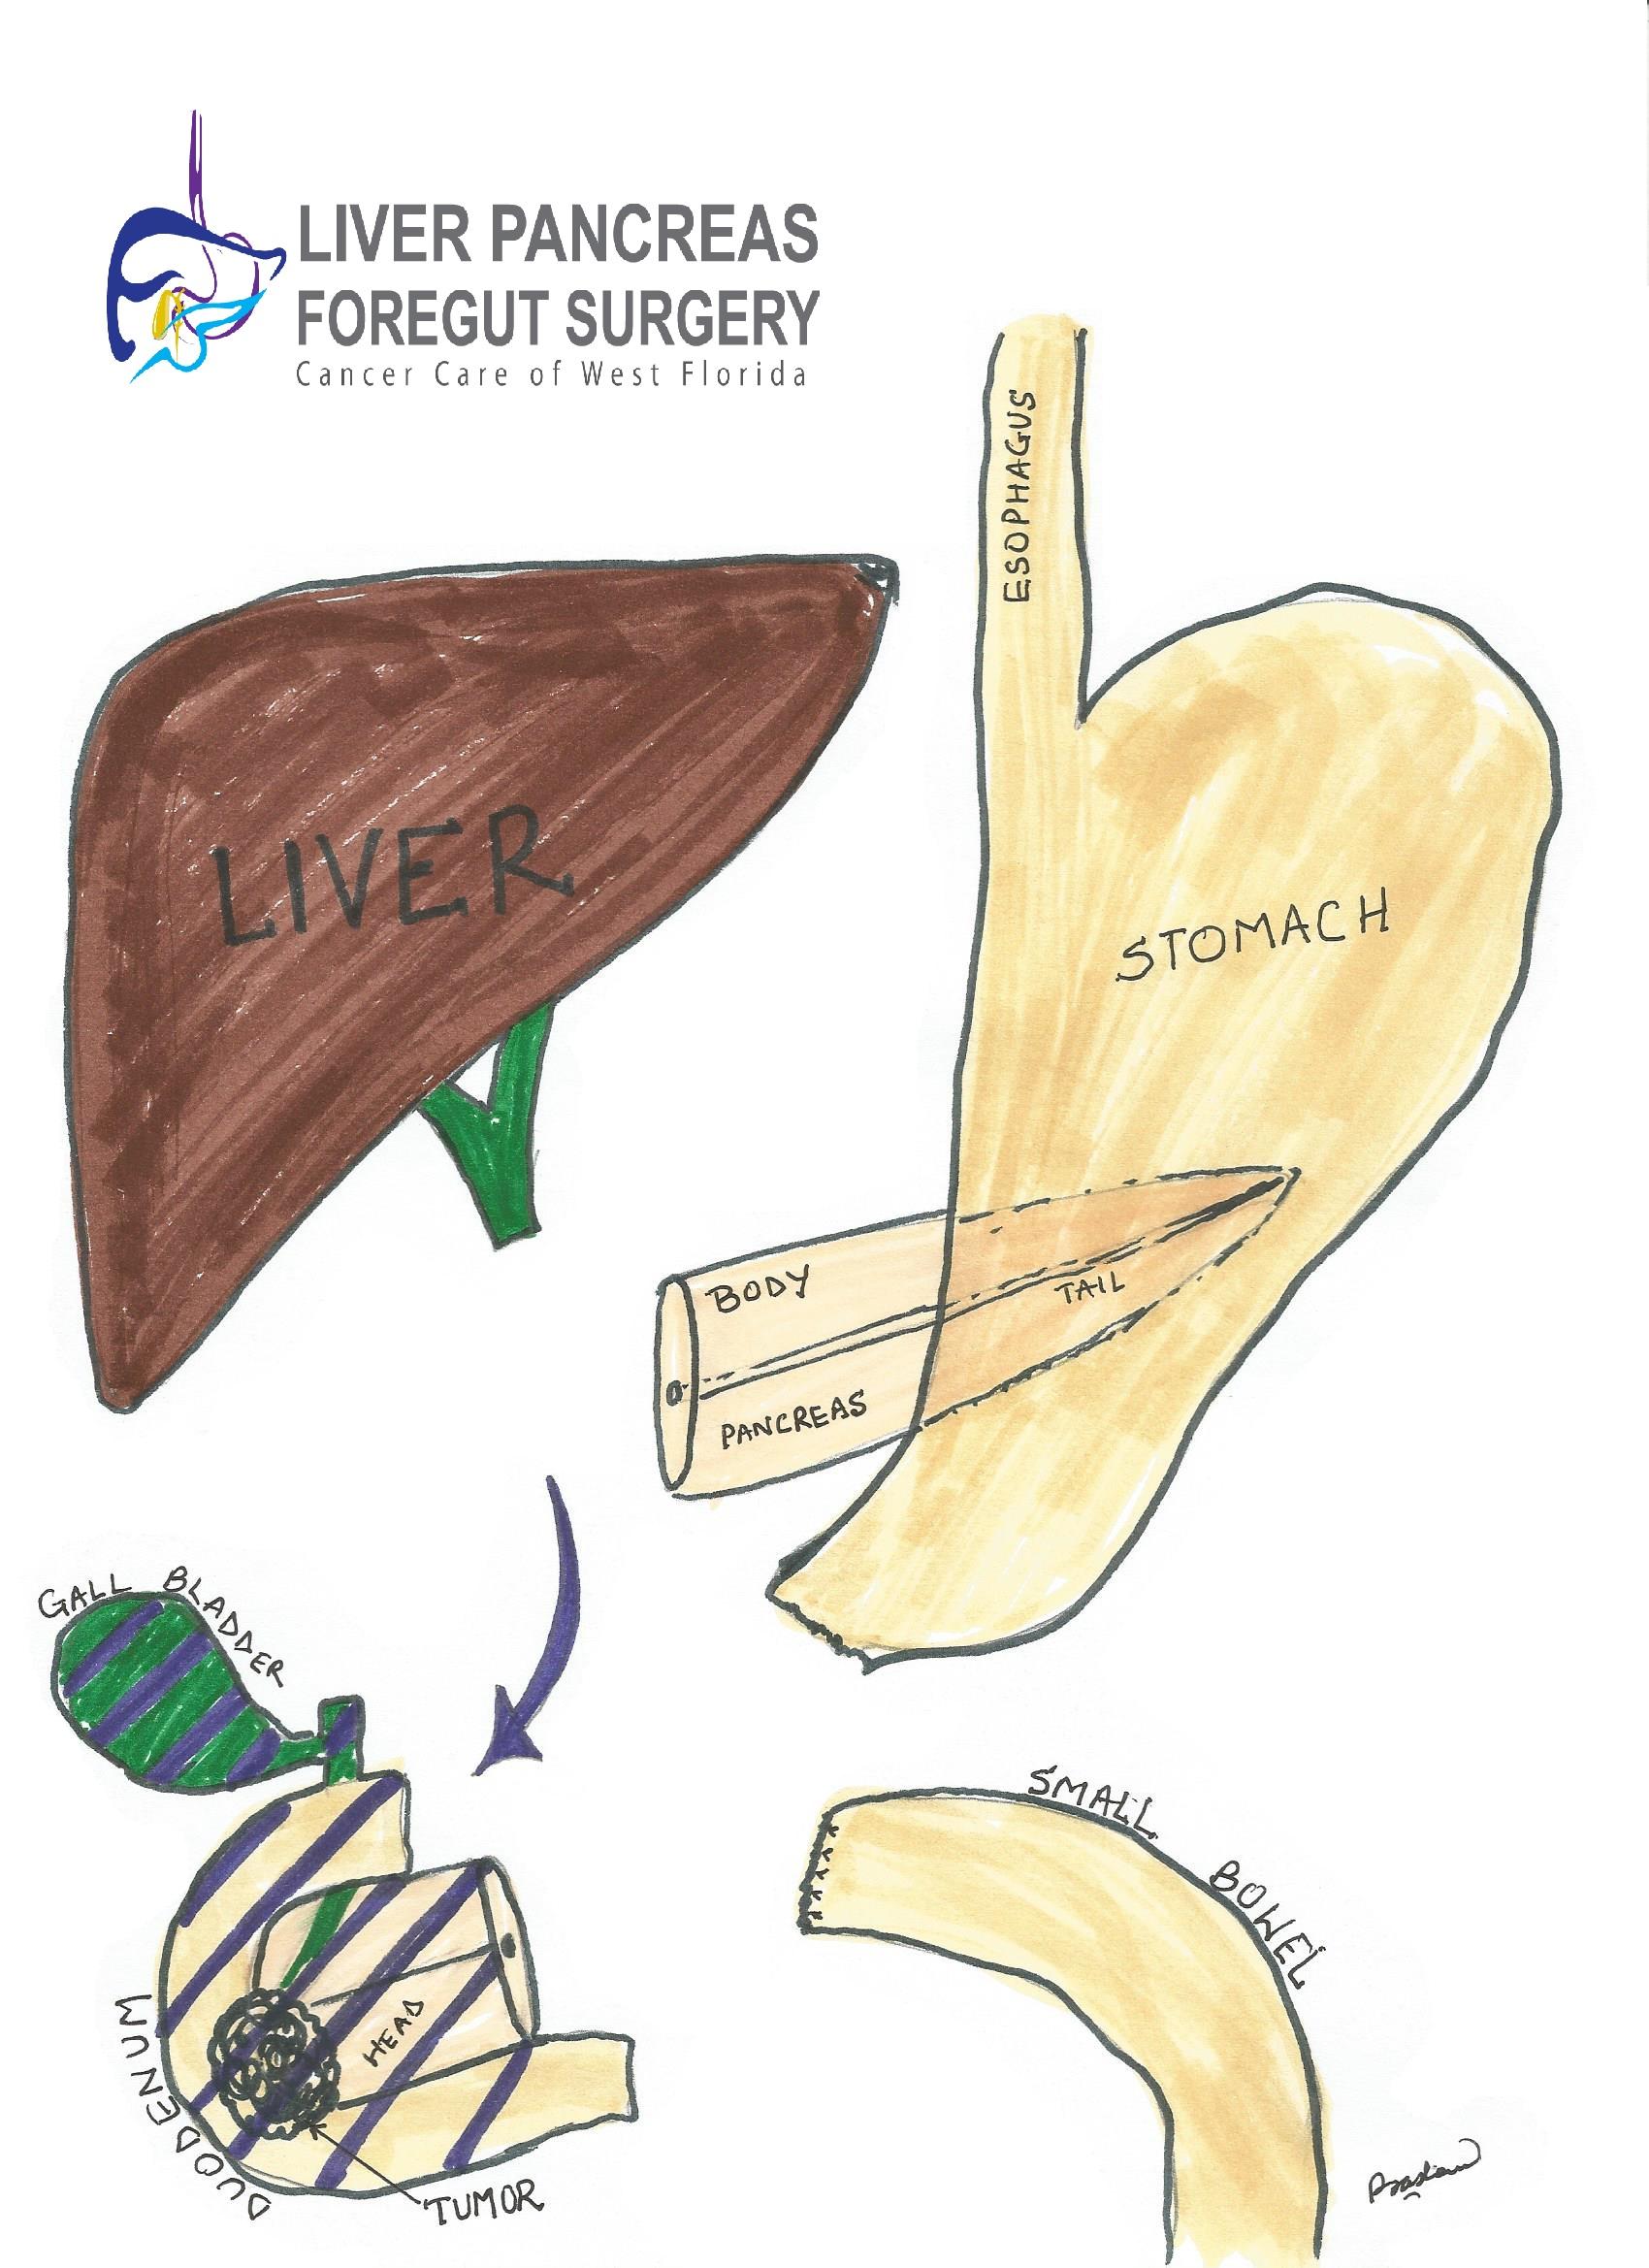 Pancreatitis treatment, Pancreas Surgery Tampa Florida | Liver Pancreas